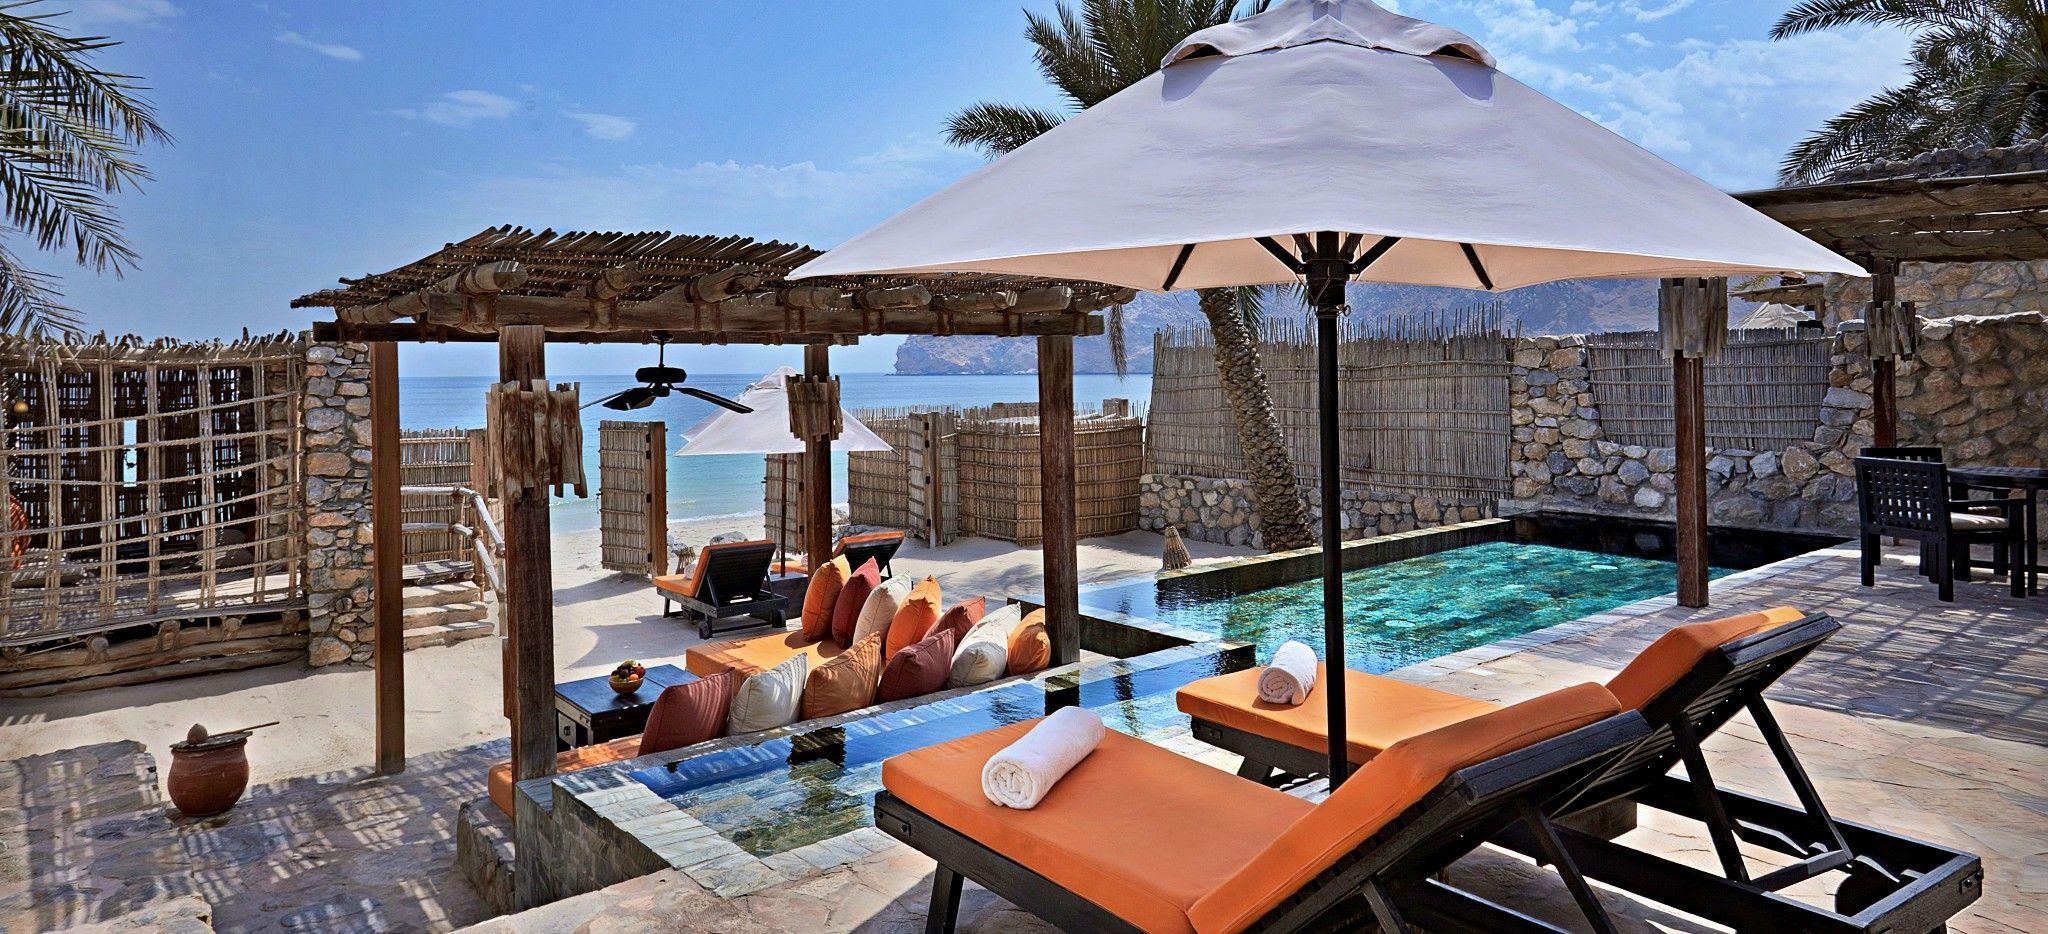 Die Terrasse eine Pool Villa Suite im Six Senses Zighy Bay, Oman